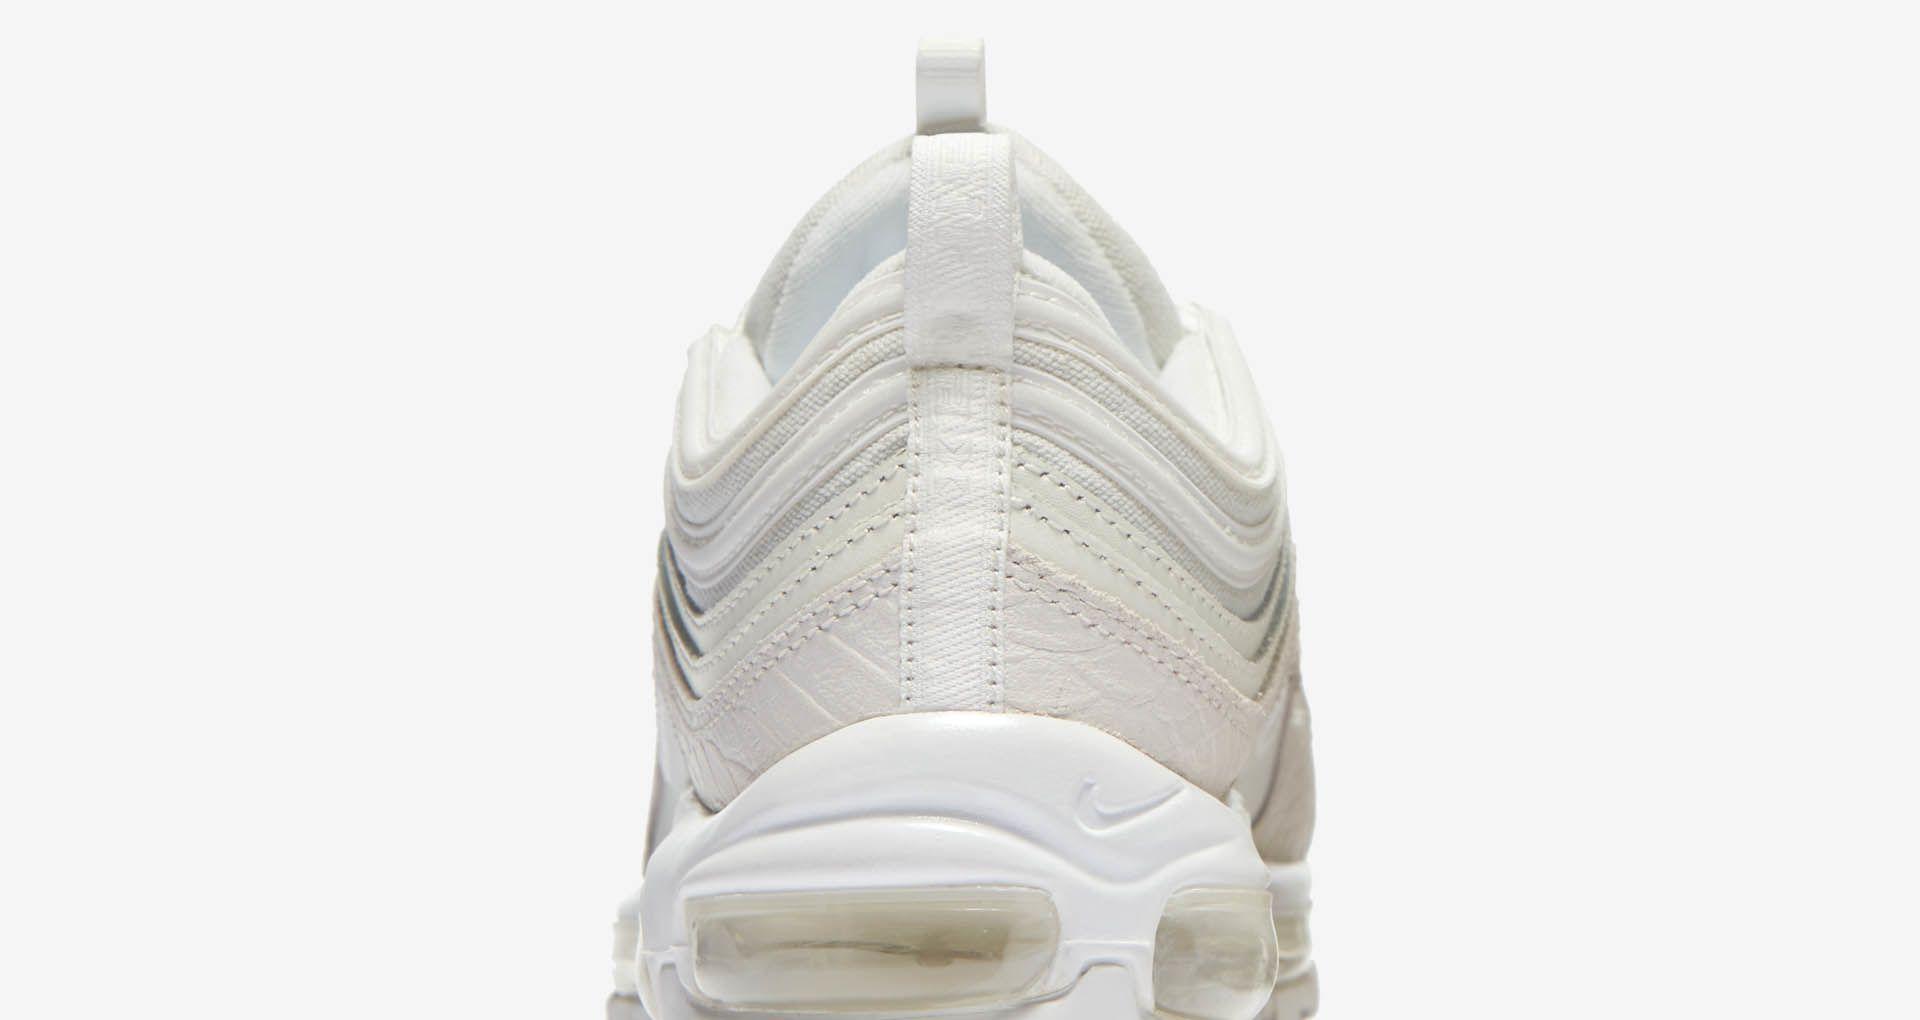 00e4f9d3027a8a Nike Air Max 97  Summit White  Release Date. Nike+ Launch GB